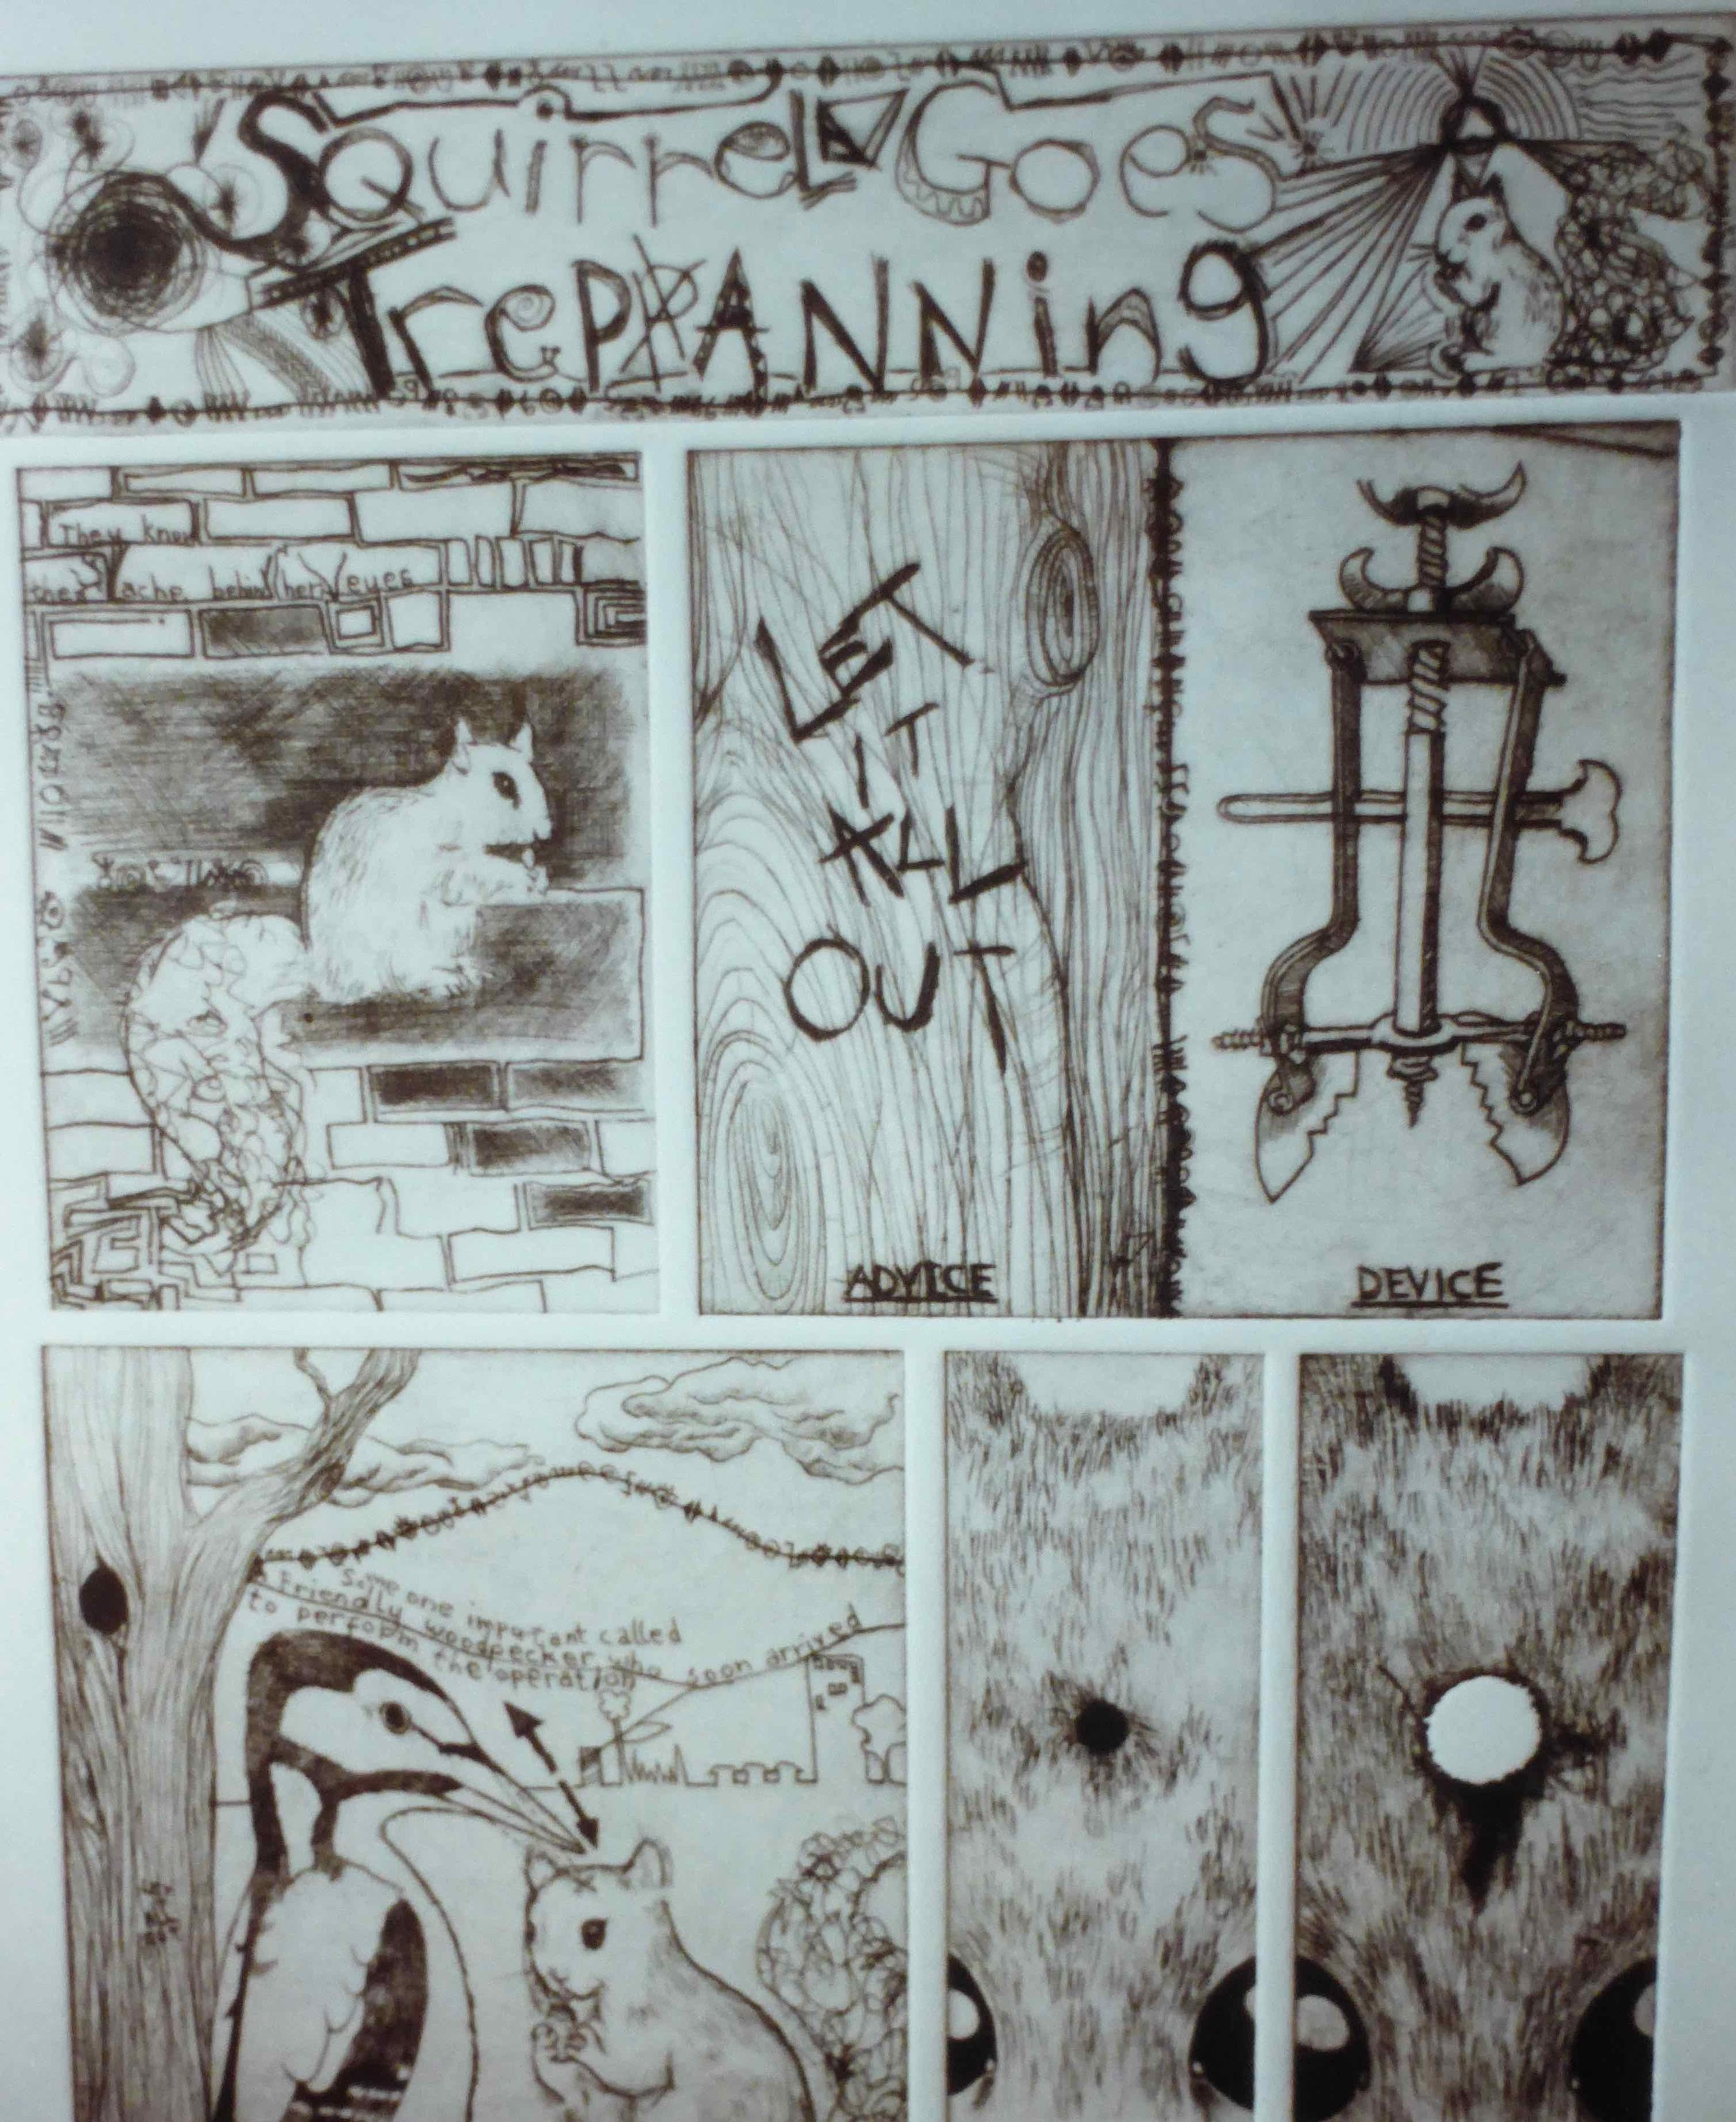 Detail from Squirrel Goes Trepanning (intaglio), 2004.